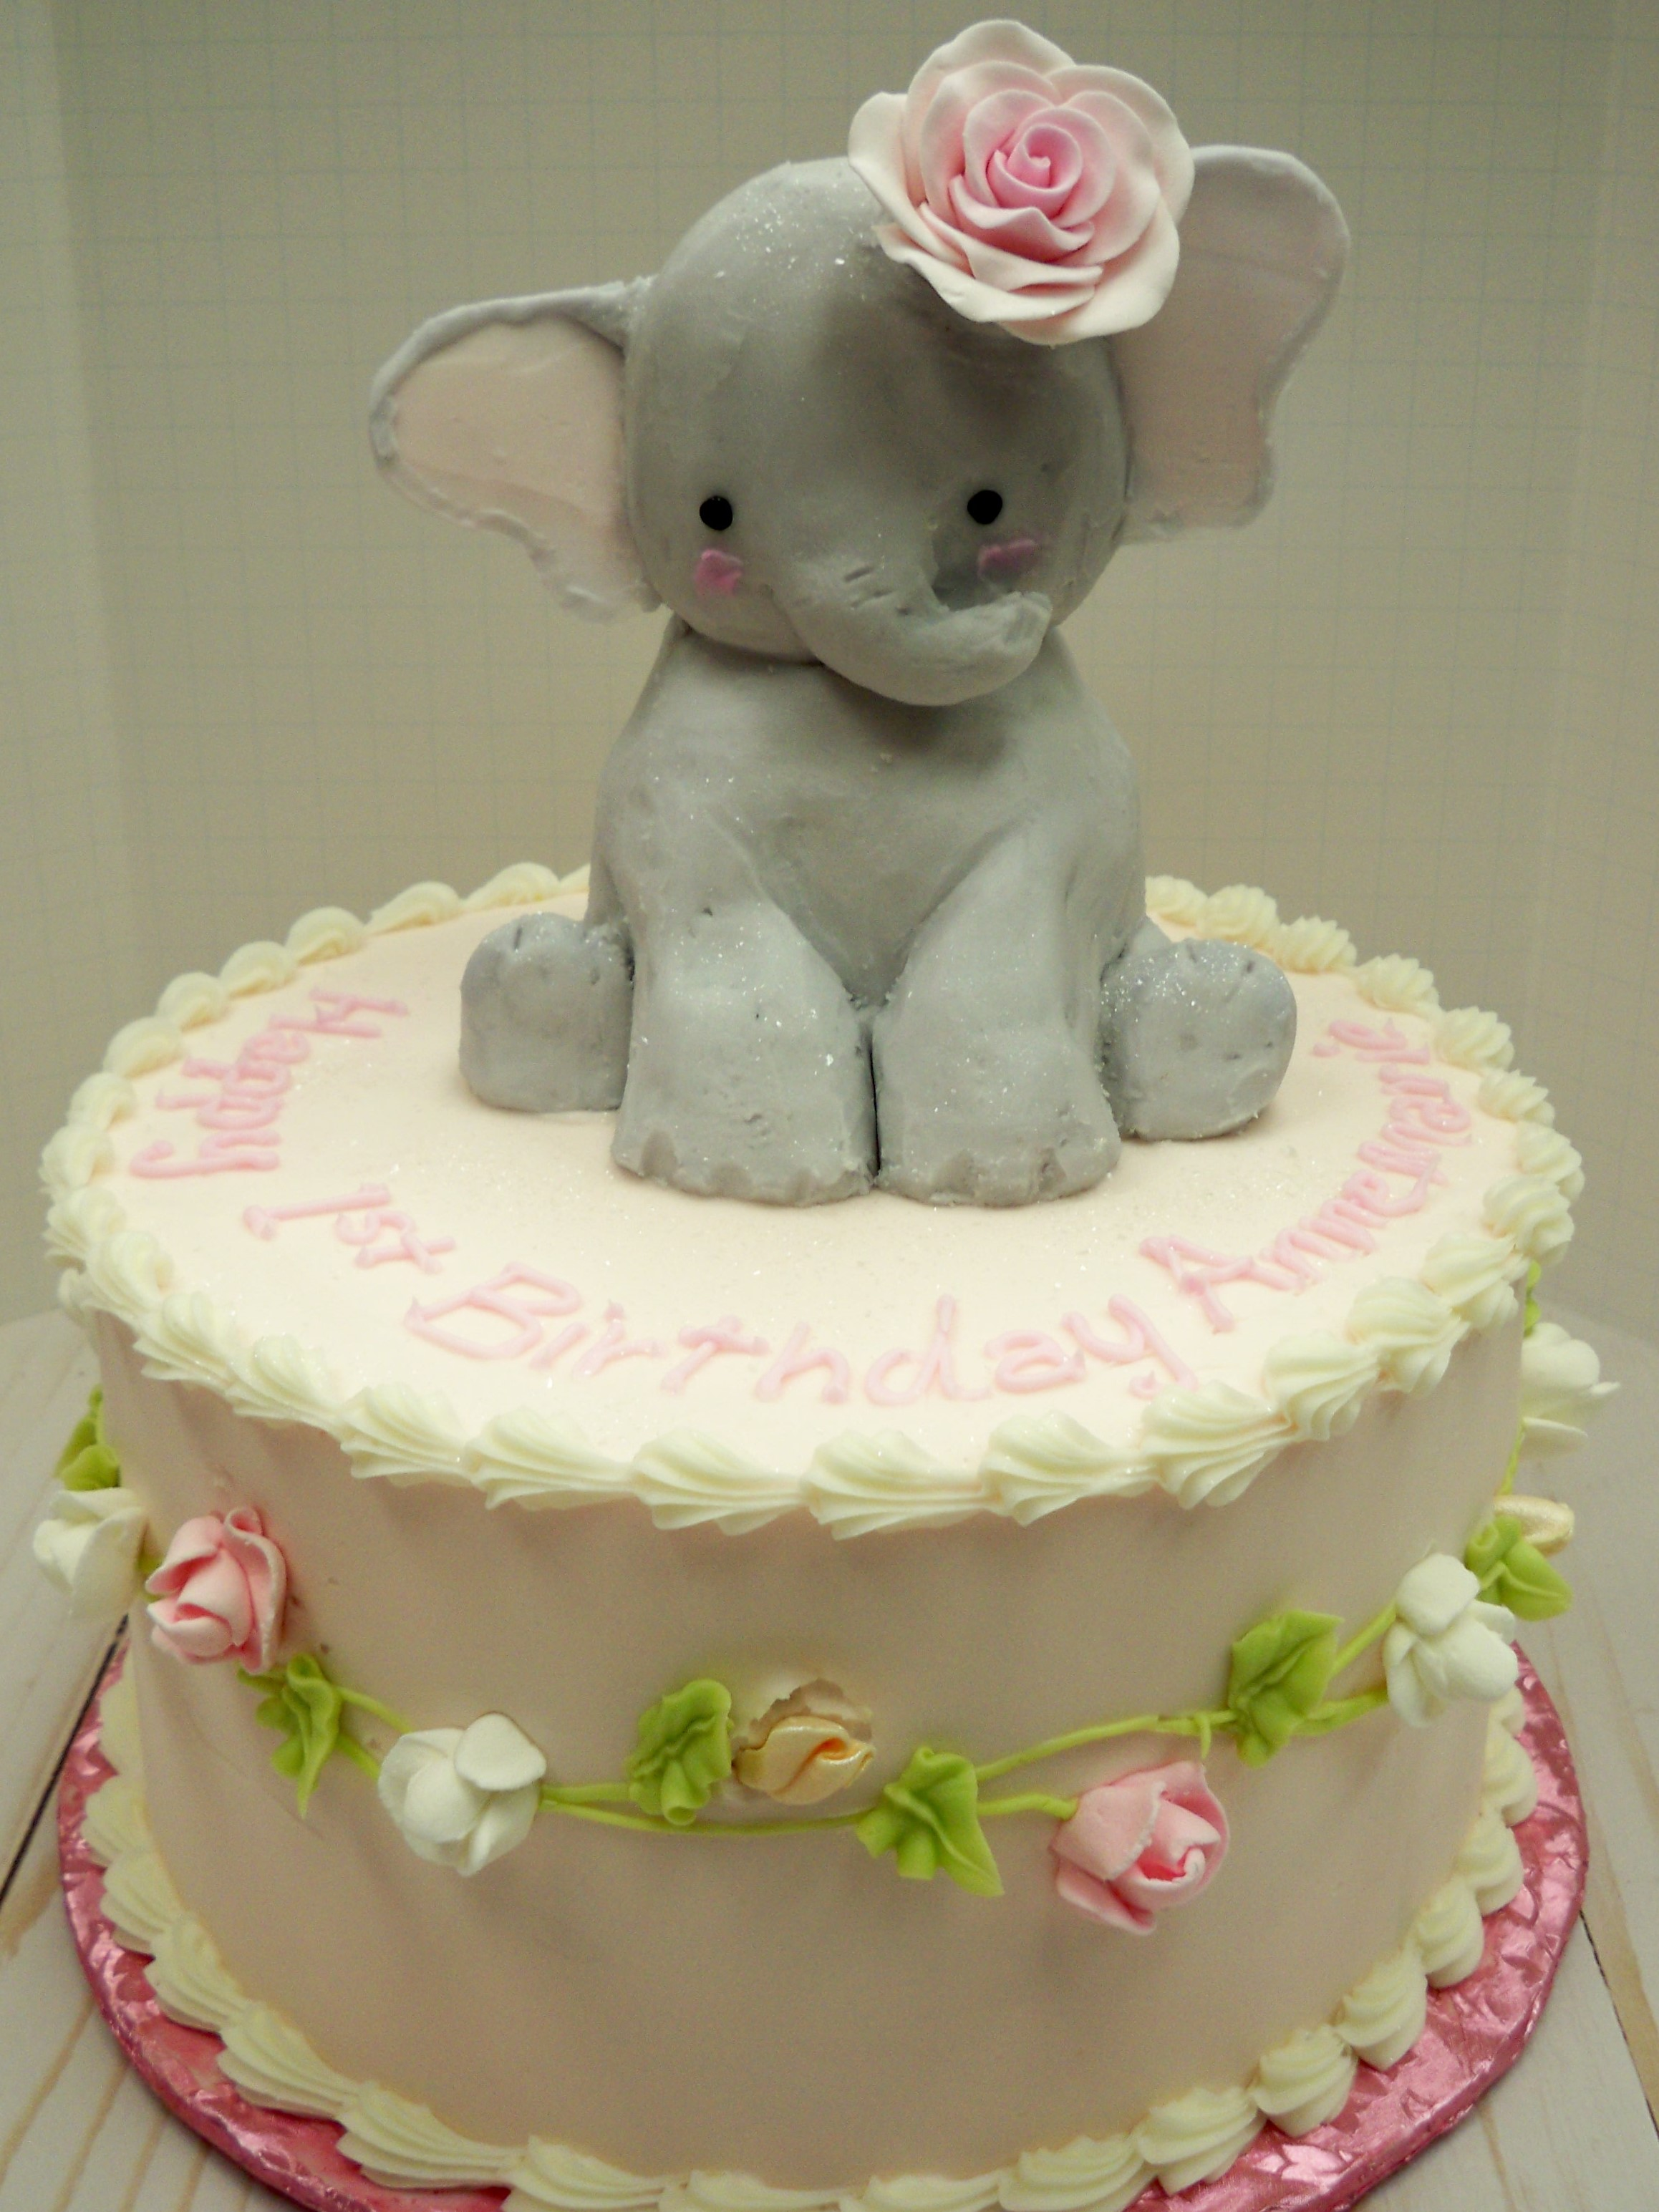 Baby elephant cake, baby shower cake, birthday cake